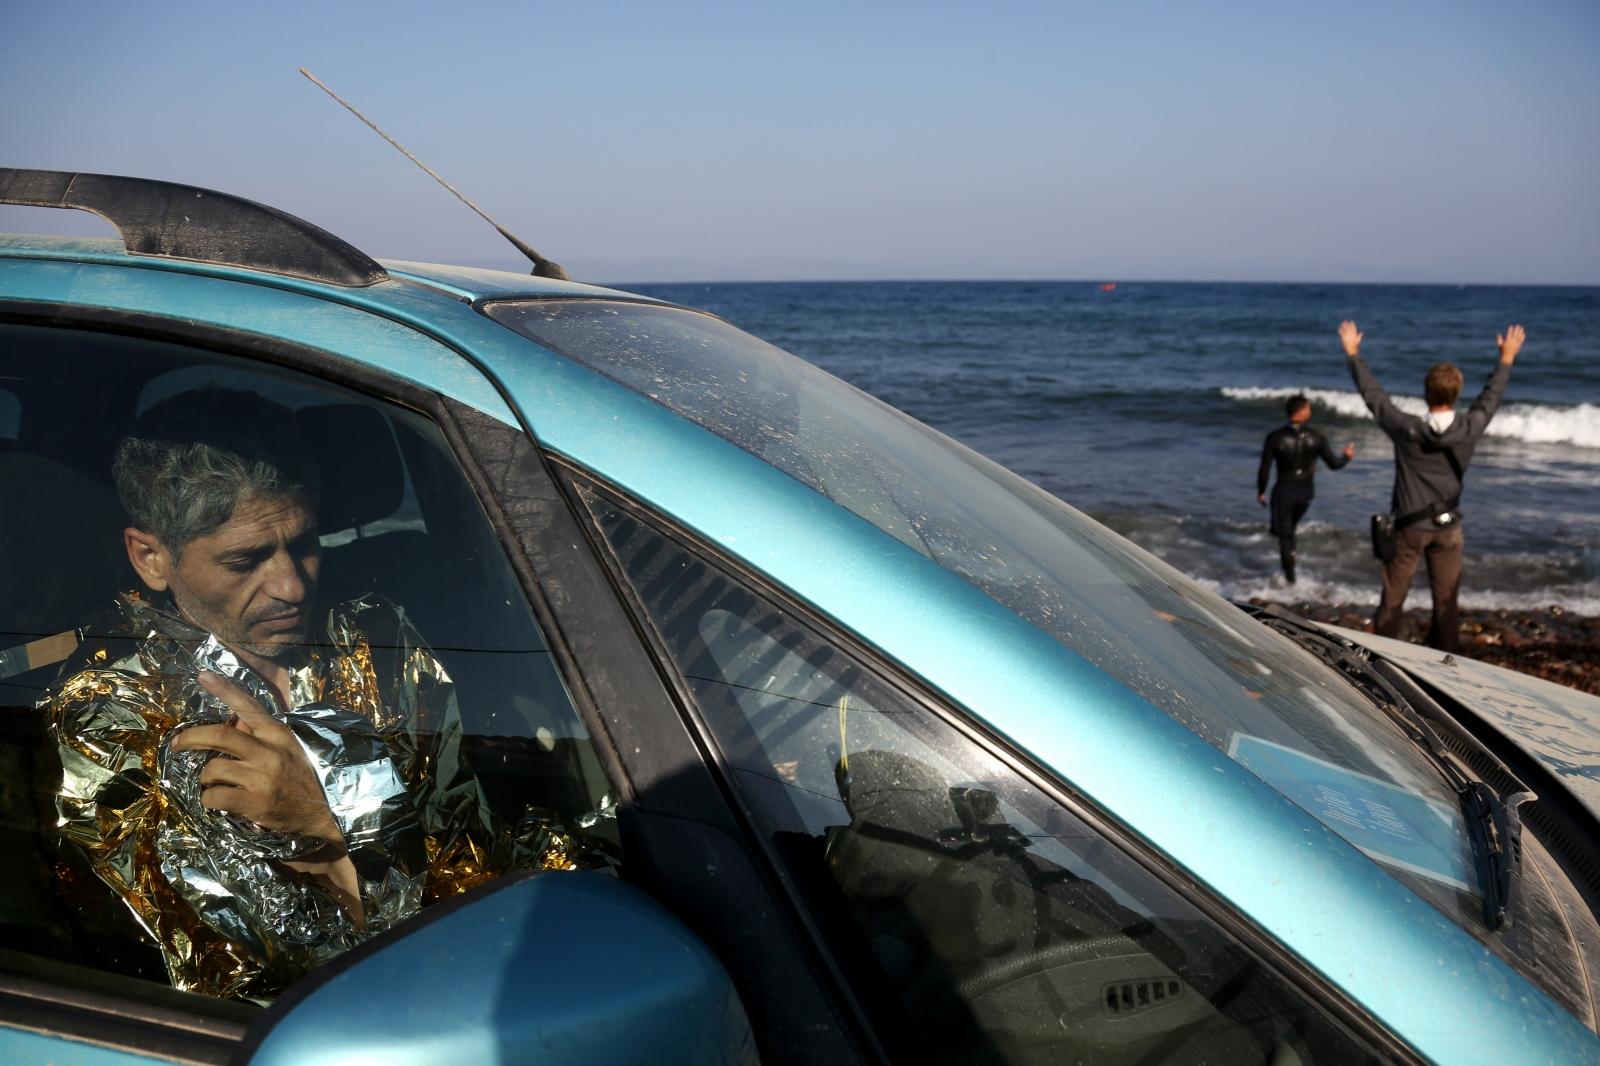 Art and Documentary Photography - Loading alexandros_katsis_lesbos_refuggies_11.jpg